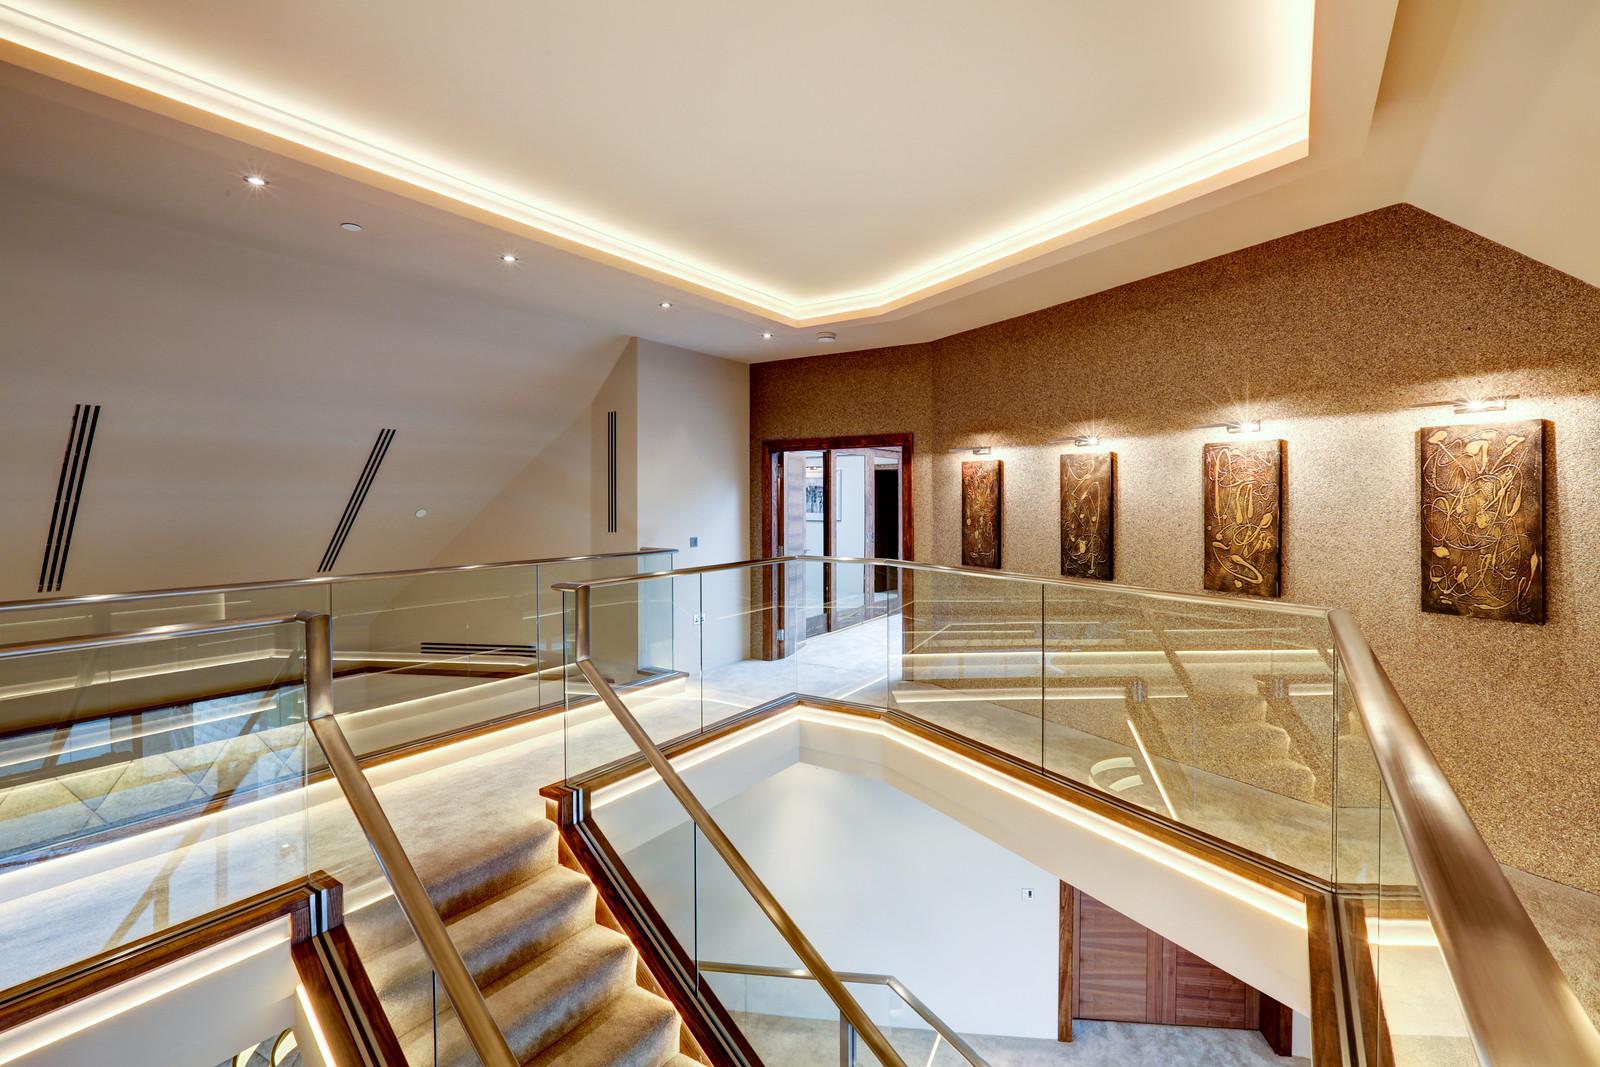 Luxury Home, Tangelwood, Colston Bassett,